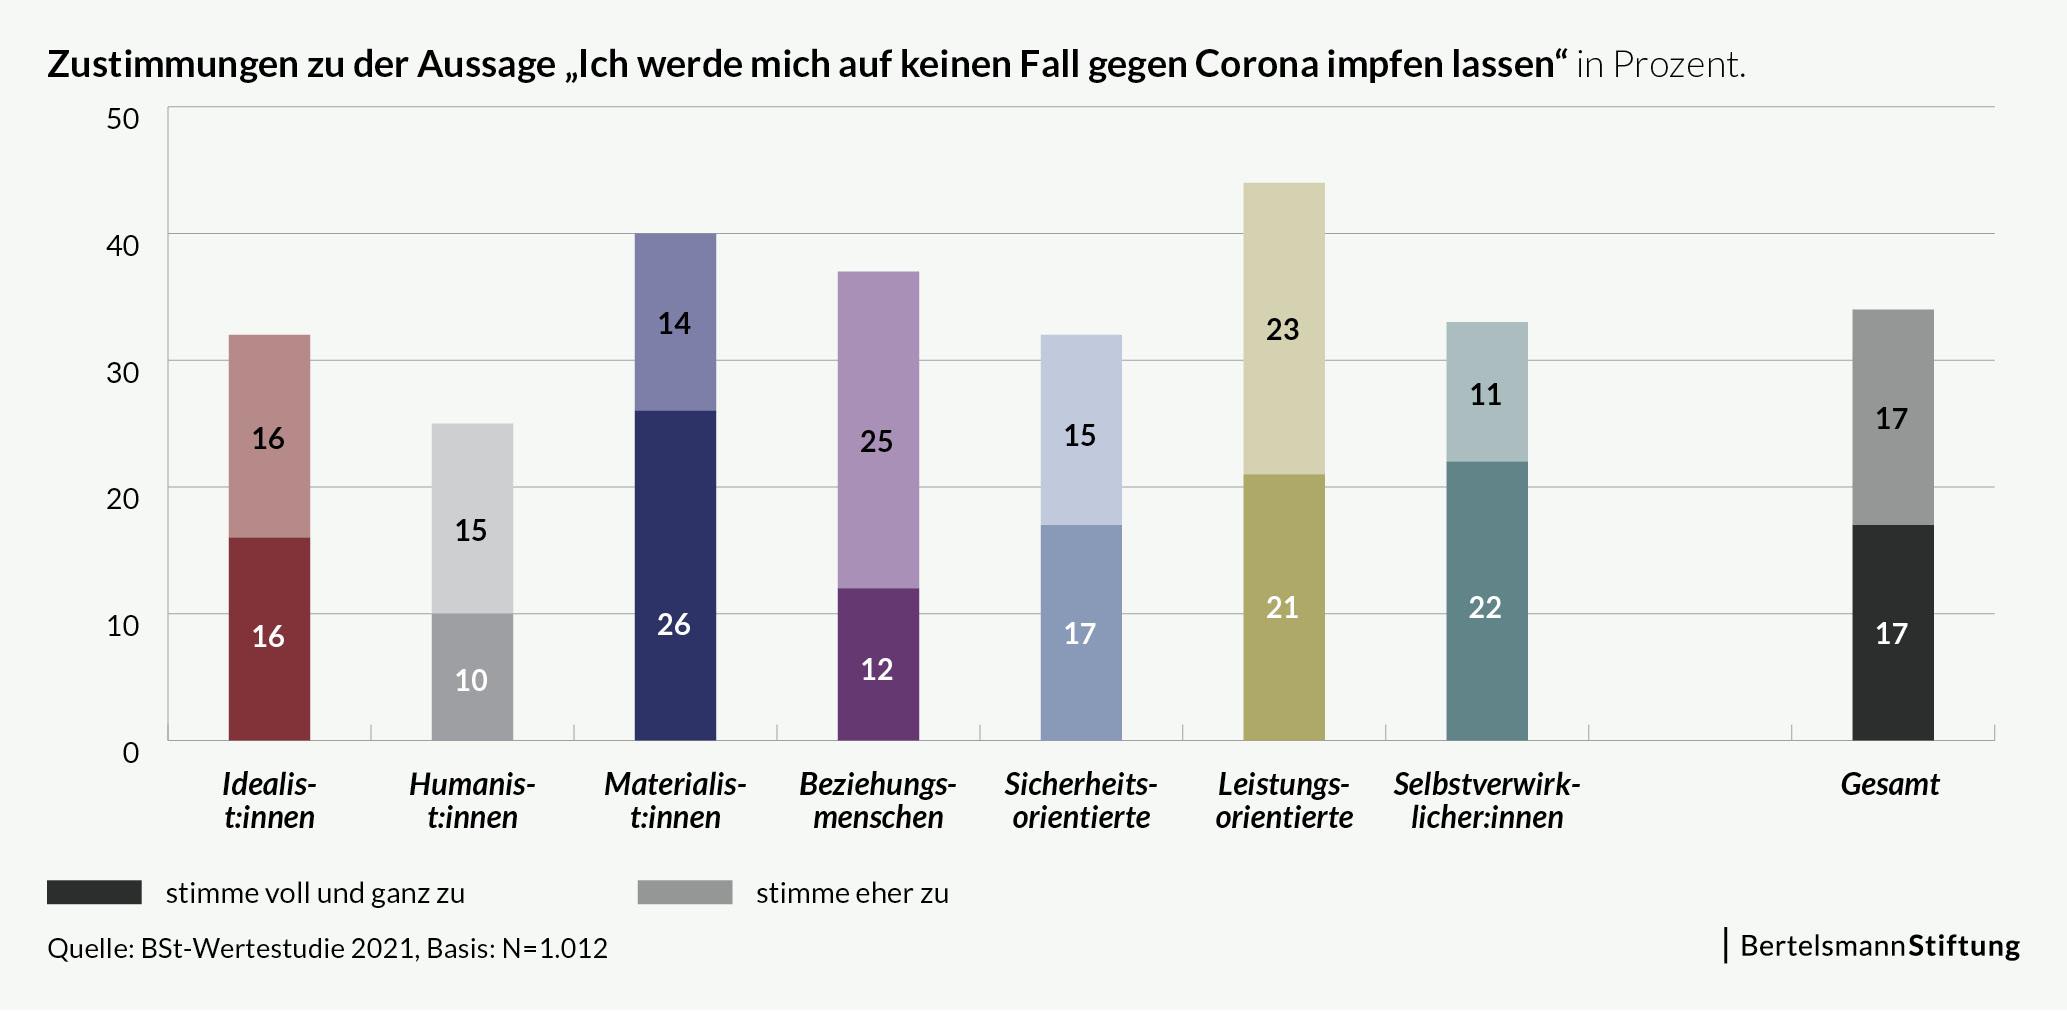 Germans Clamor for Covid Vaccines, but Shun AstraZeneca's Offering ...